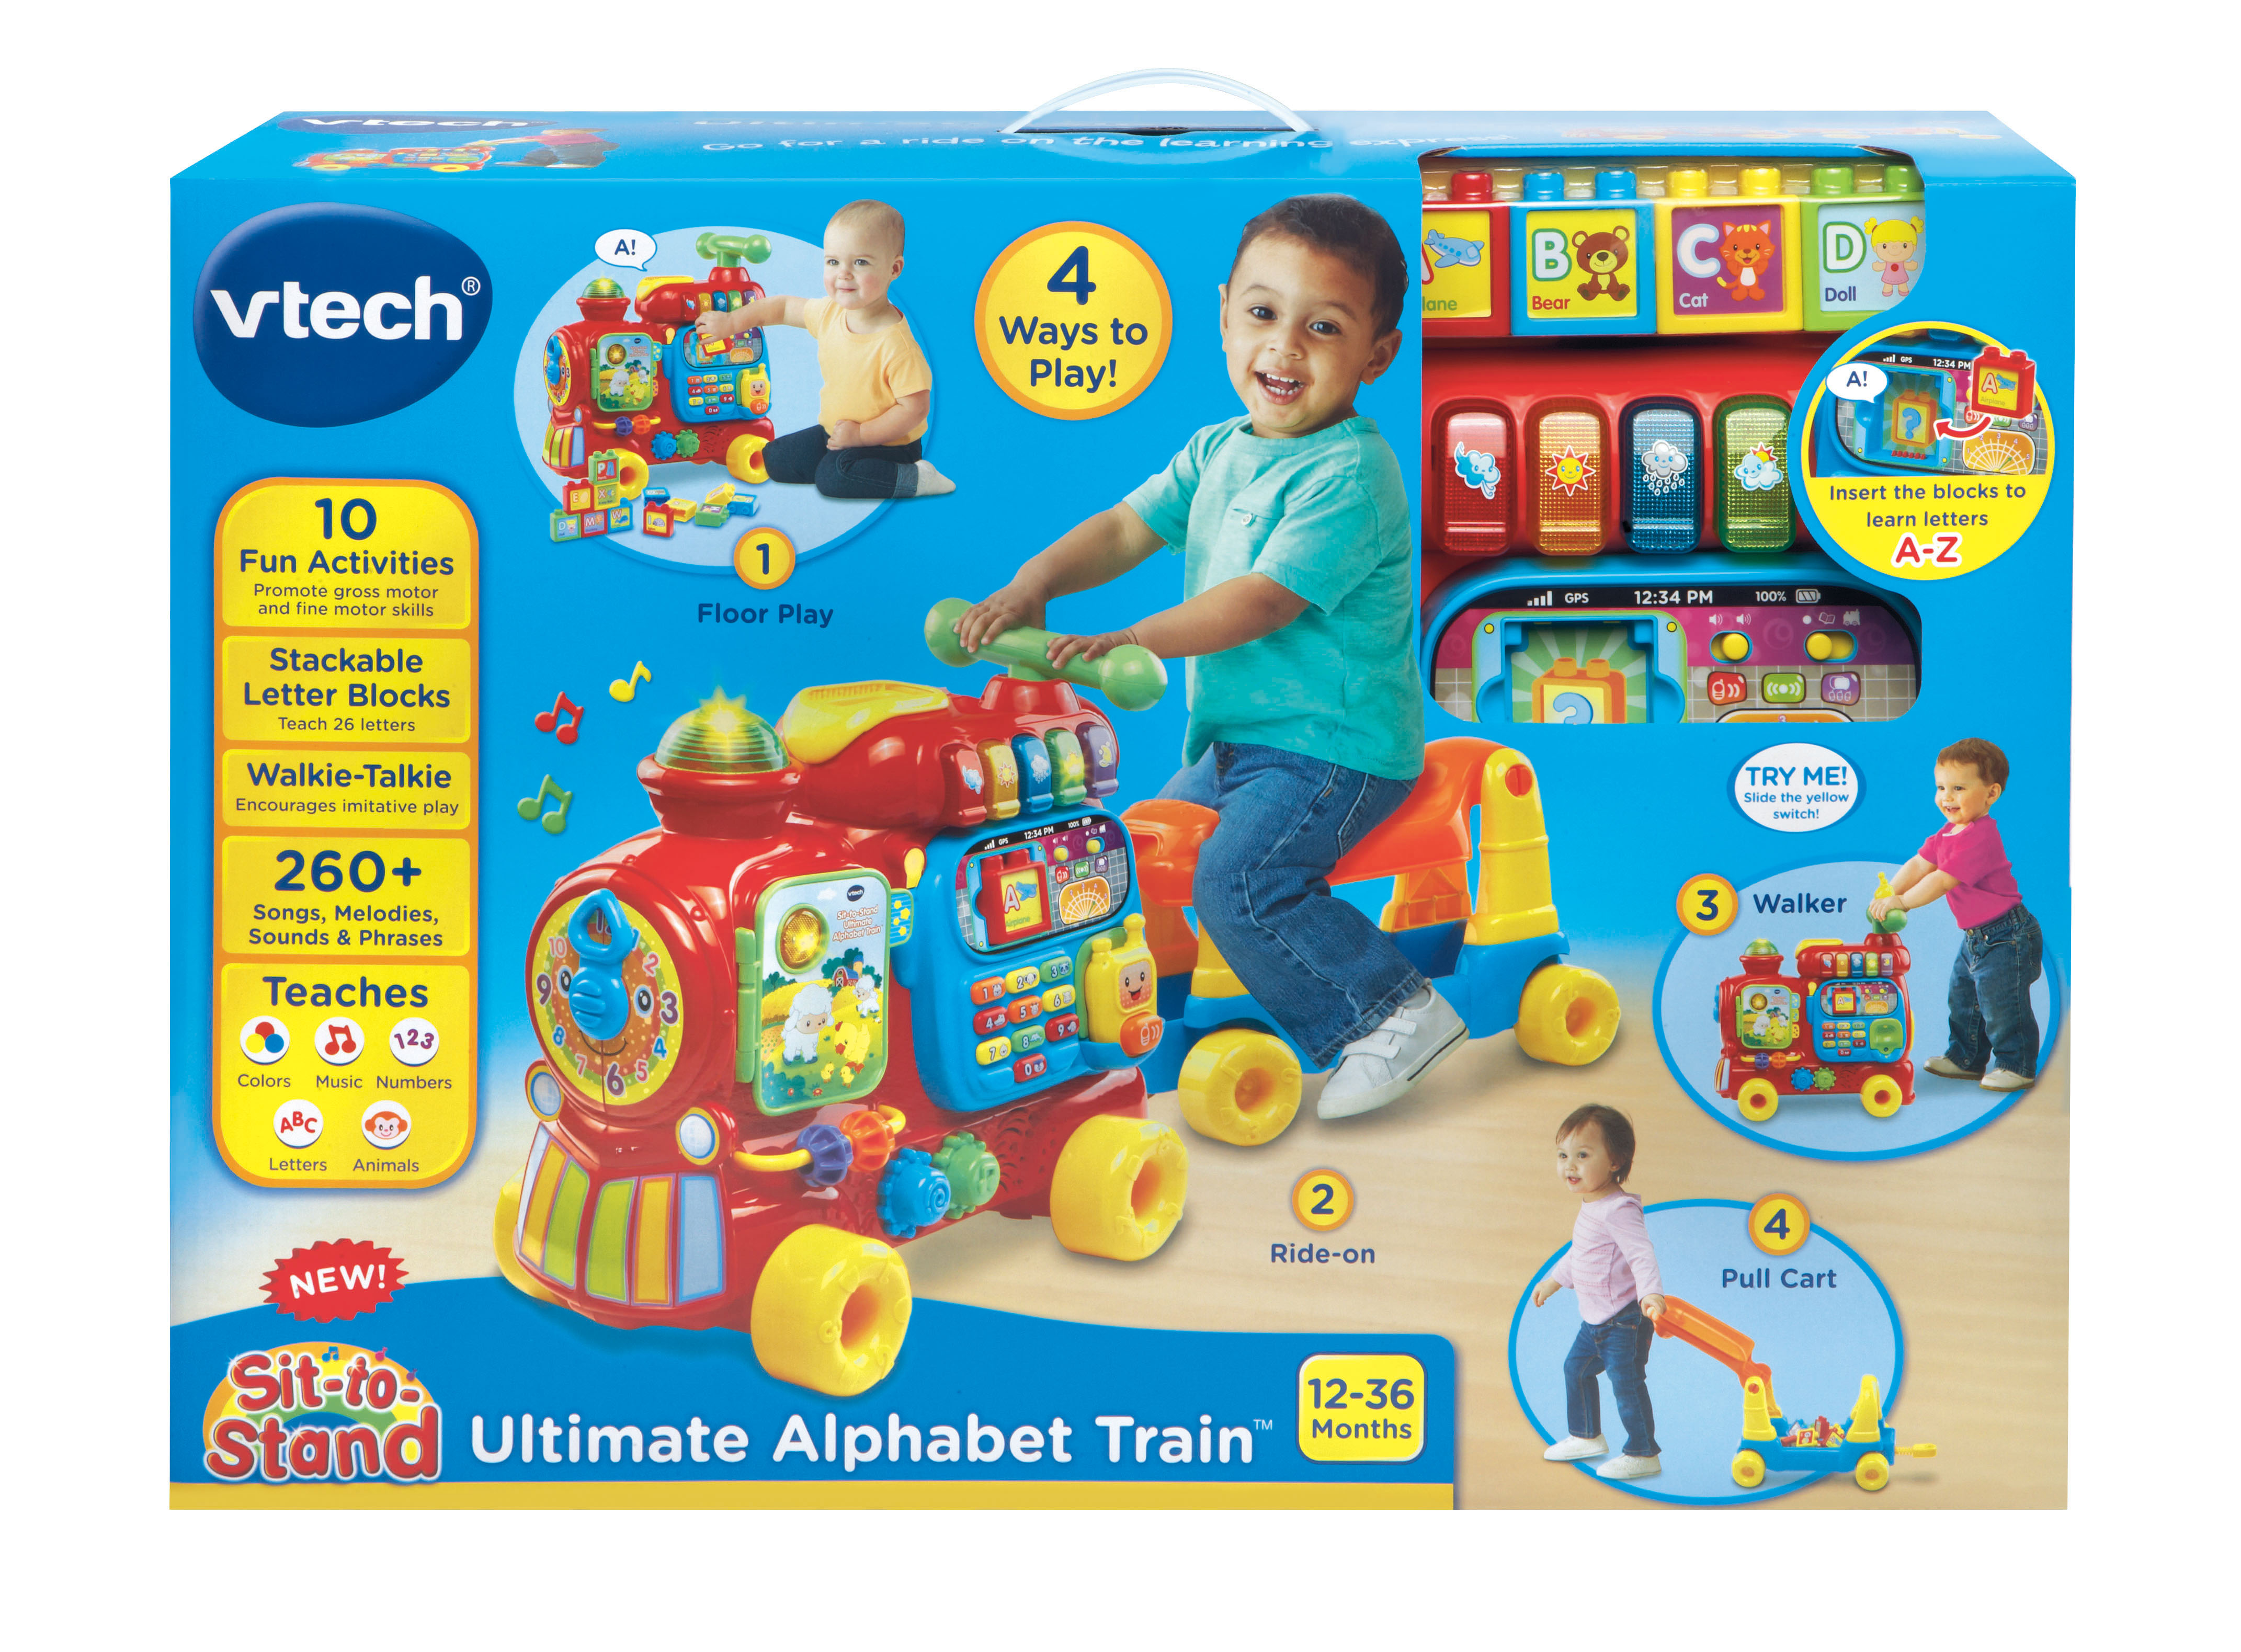 VTech Sit-to-Stand Ultimate Alphabet Train - Walmart com